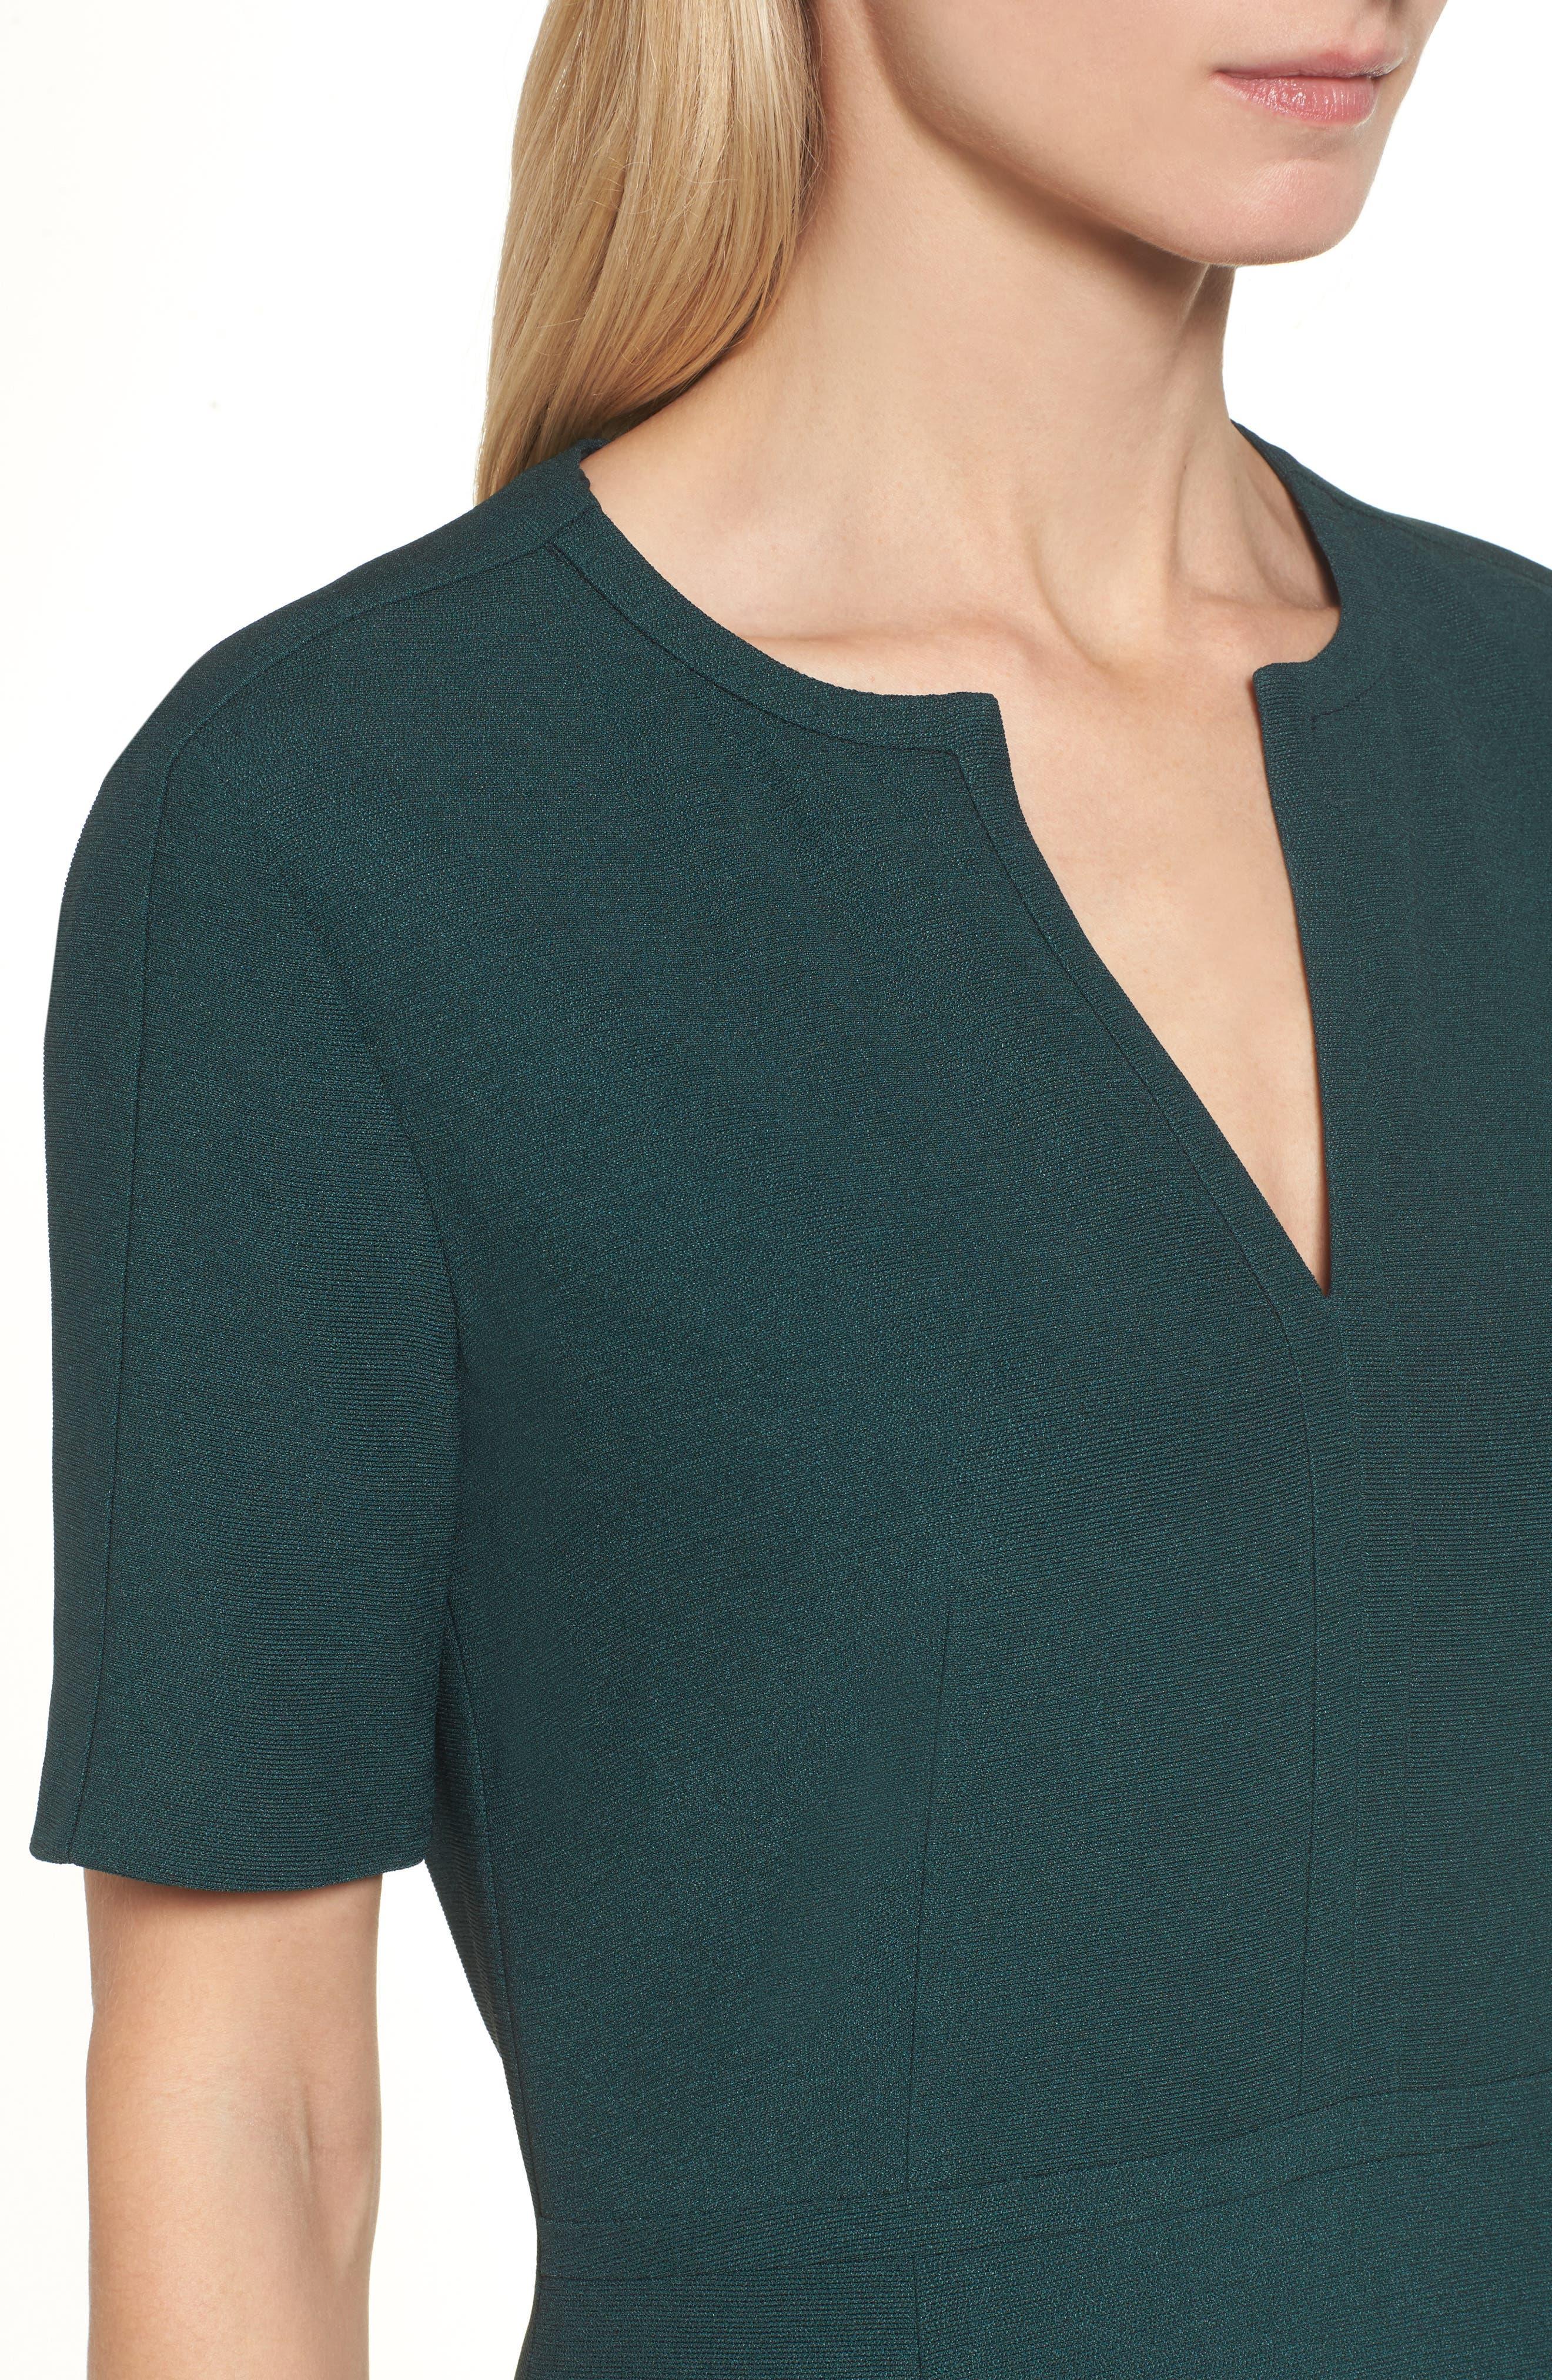 Dalesana Sheath Dress,                             Alternate thumbnail 4, color,                             Peacock Green